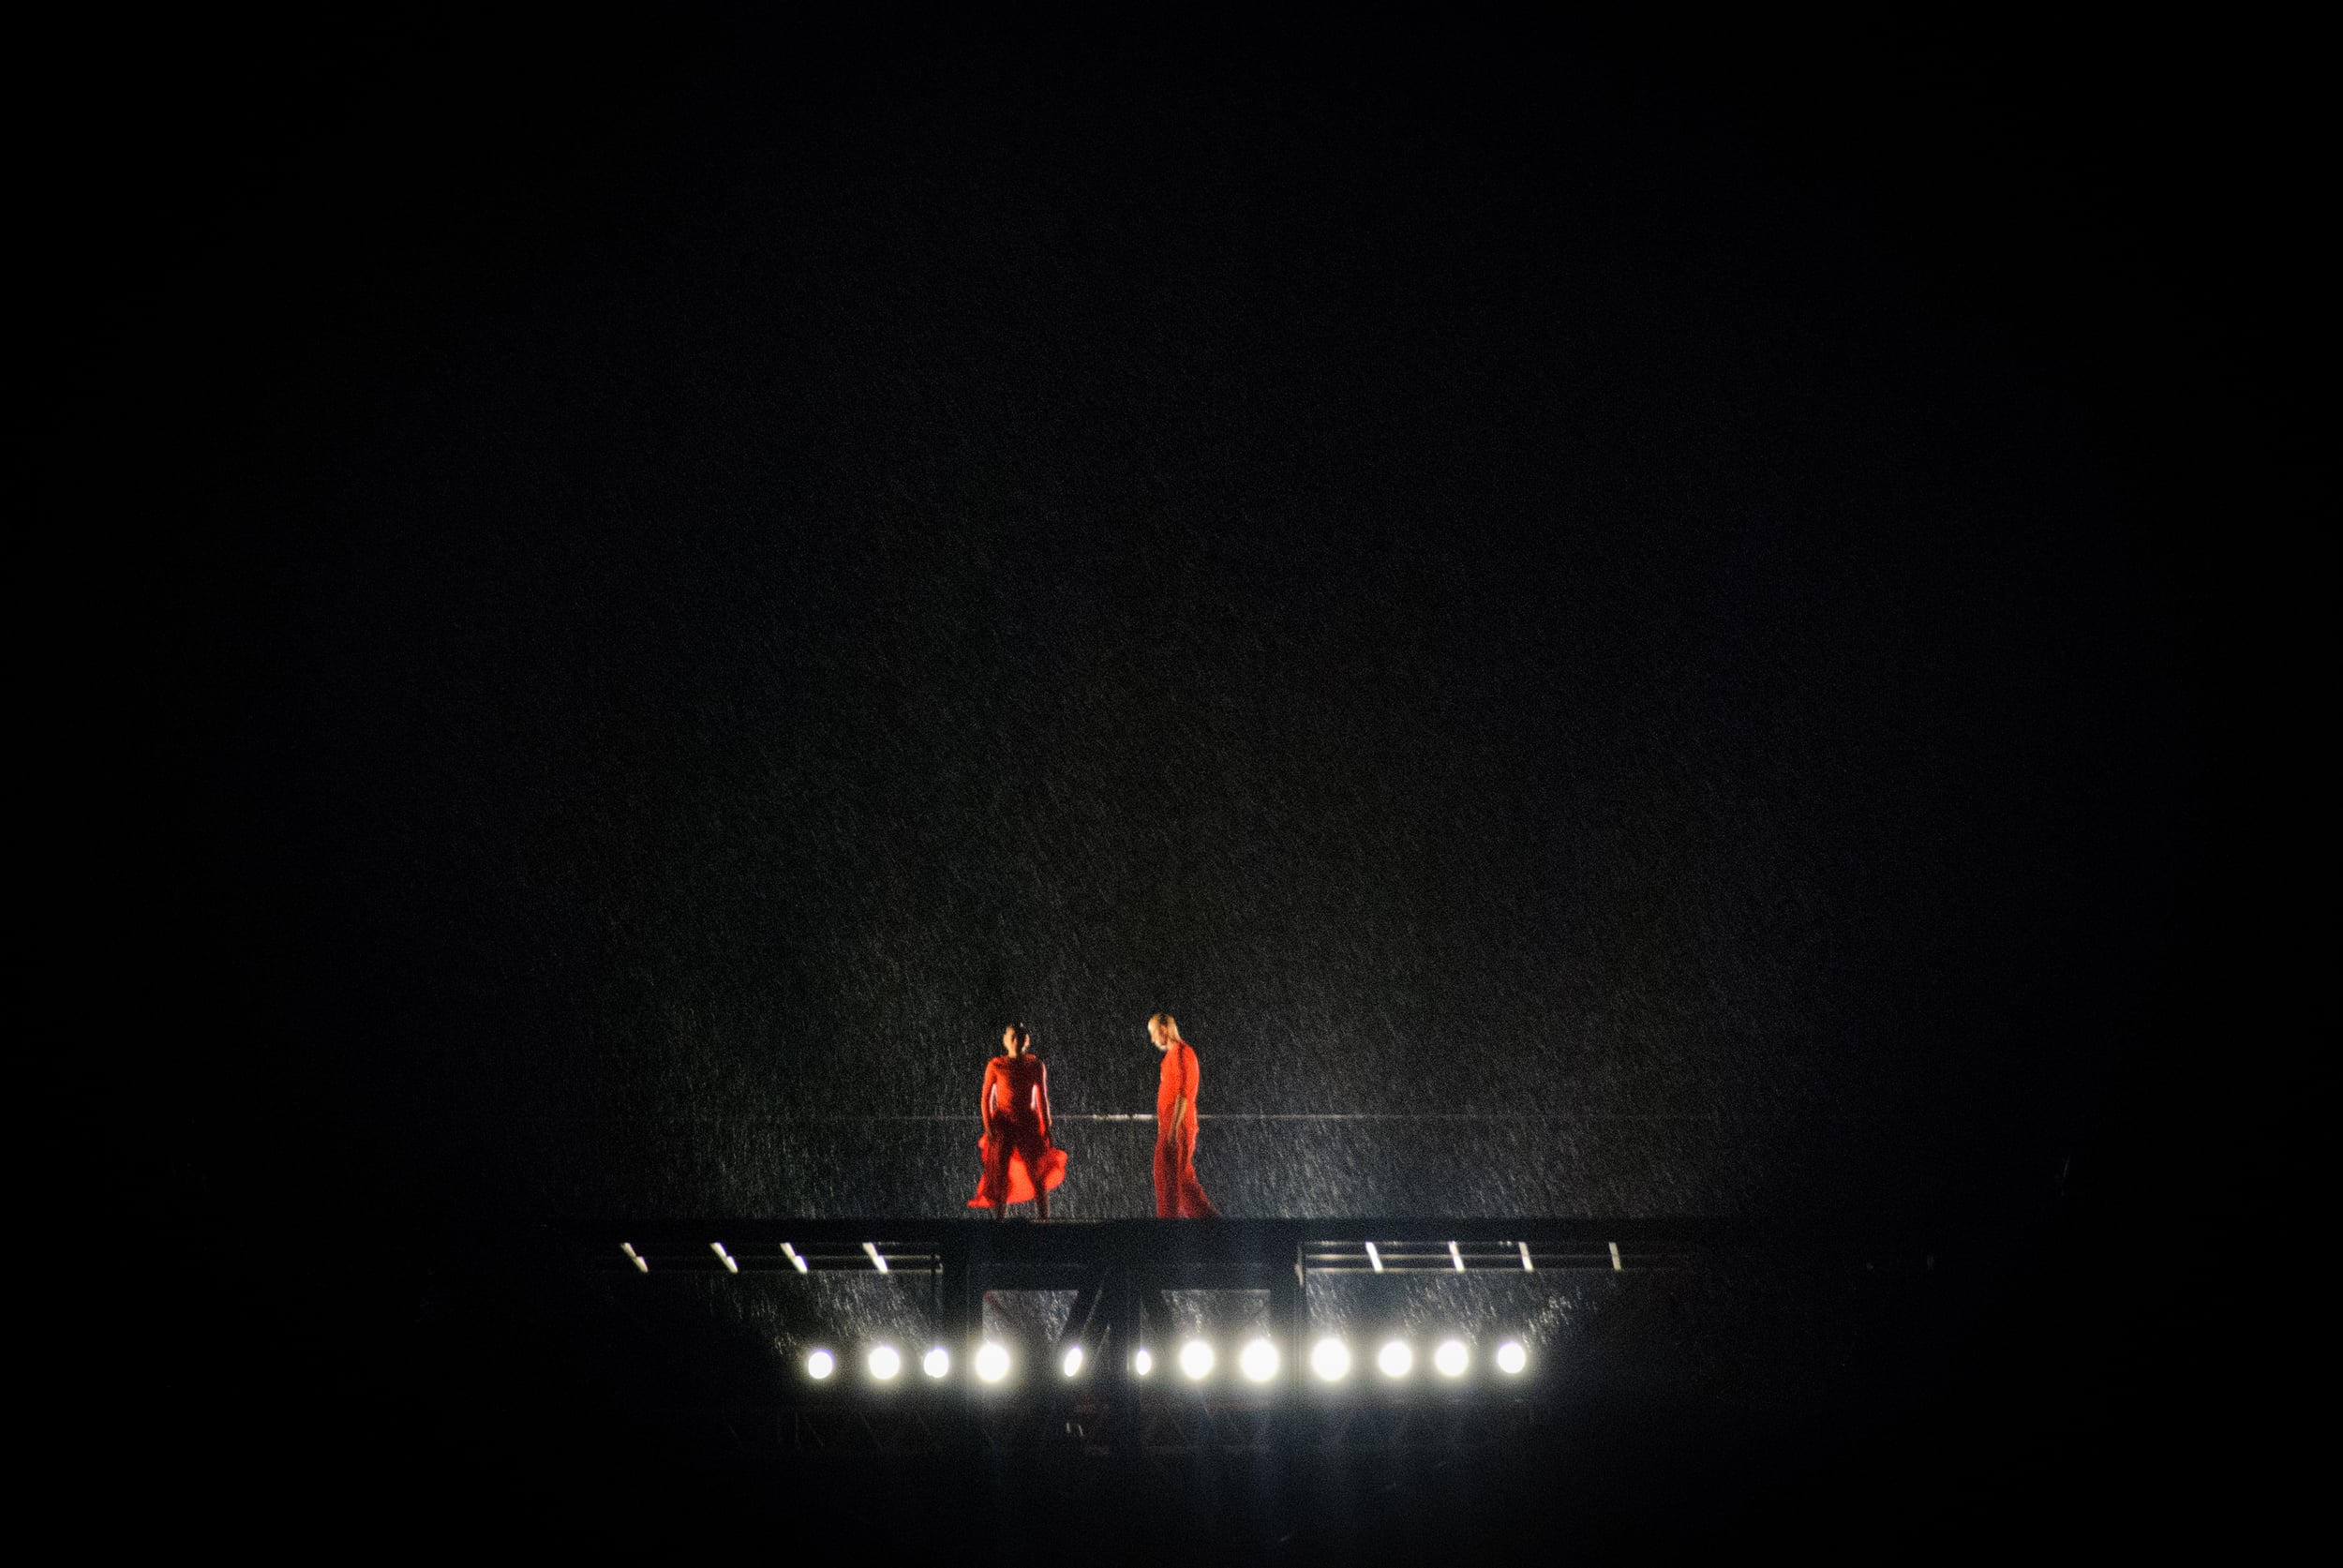 Red in rain